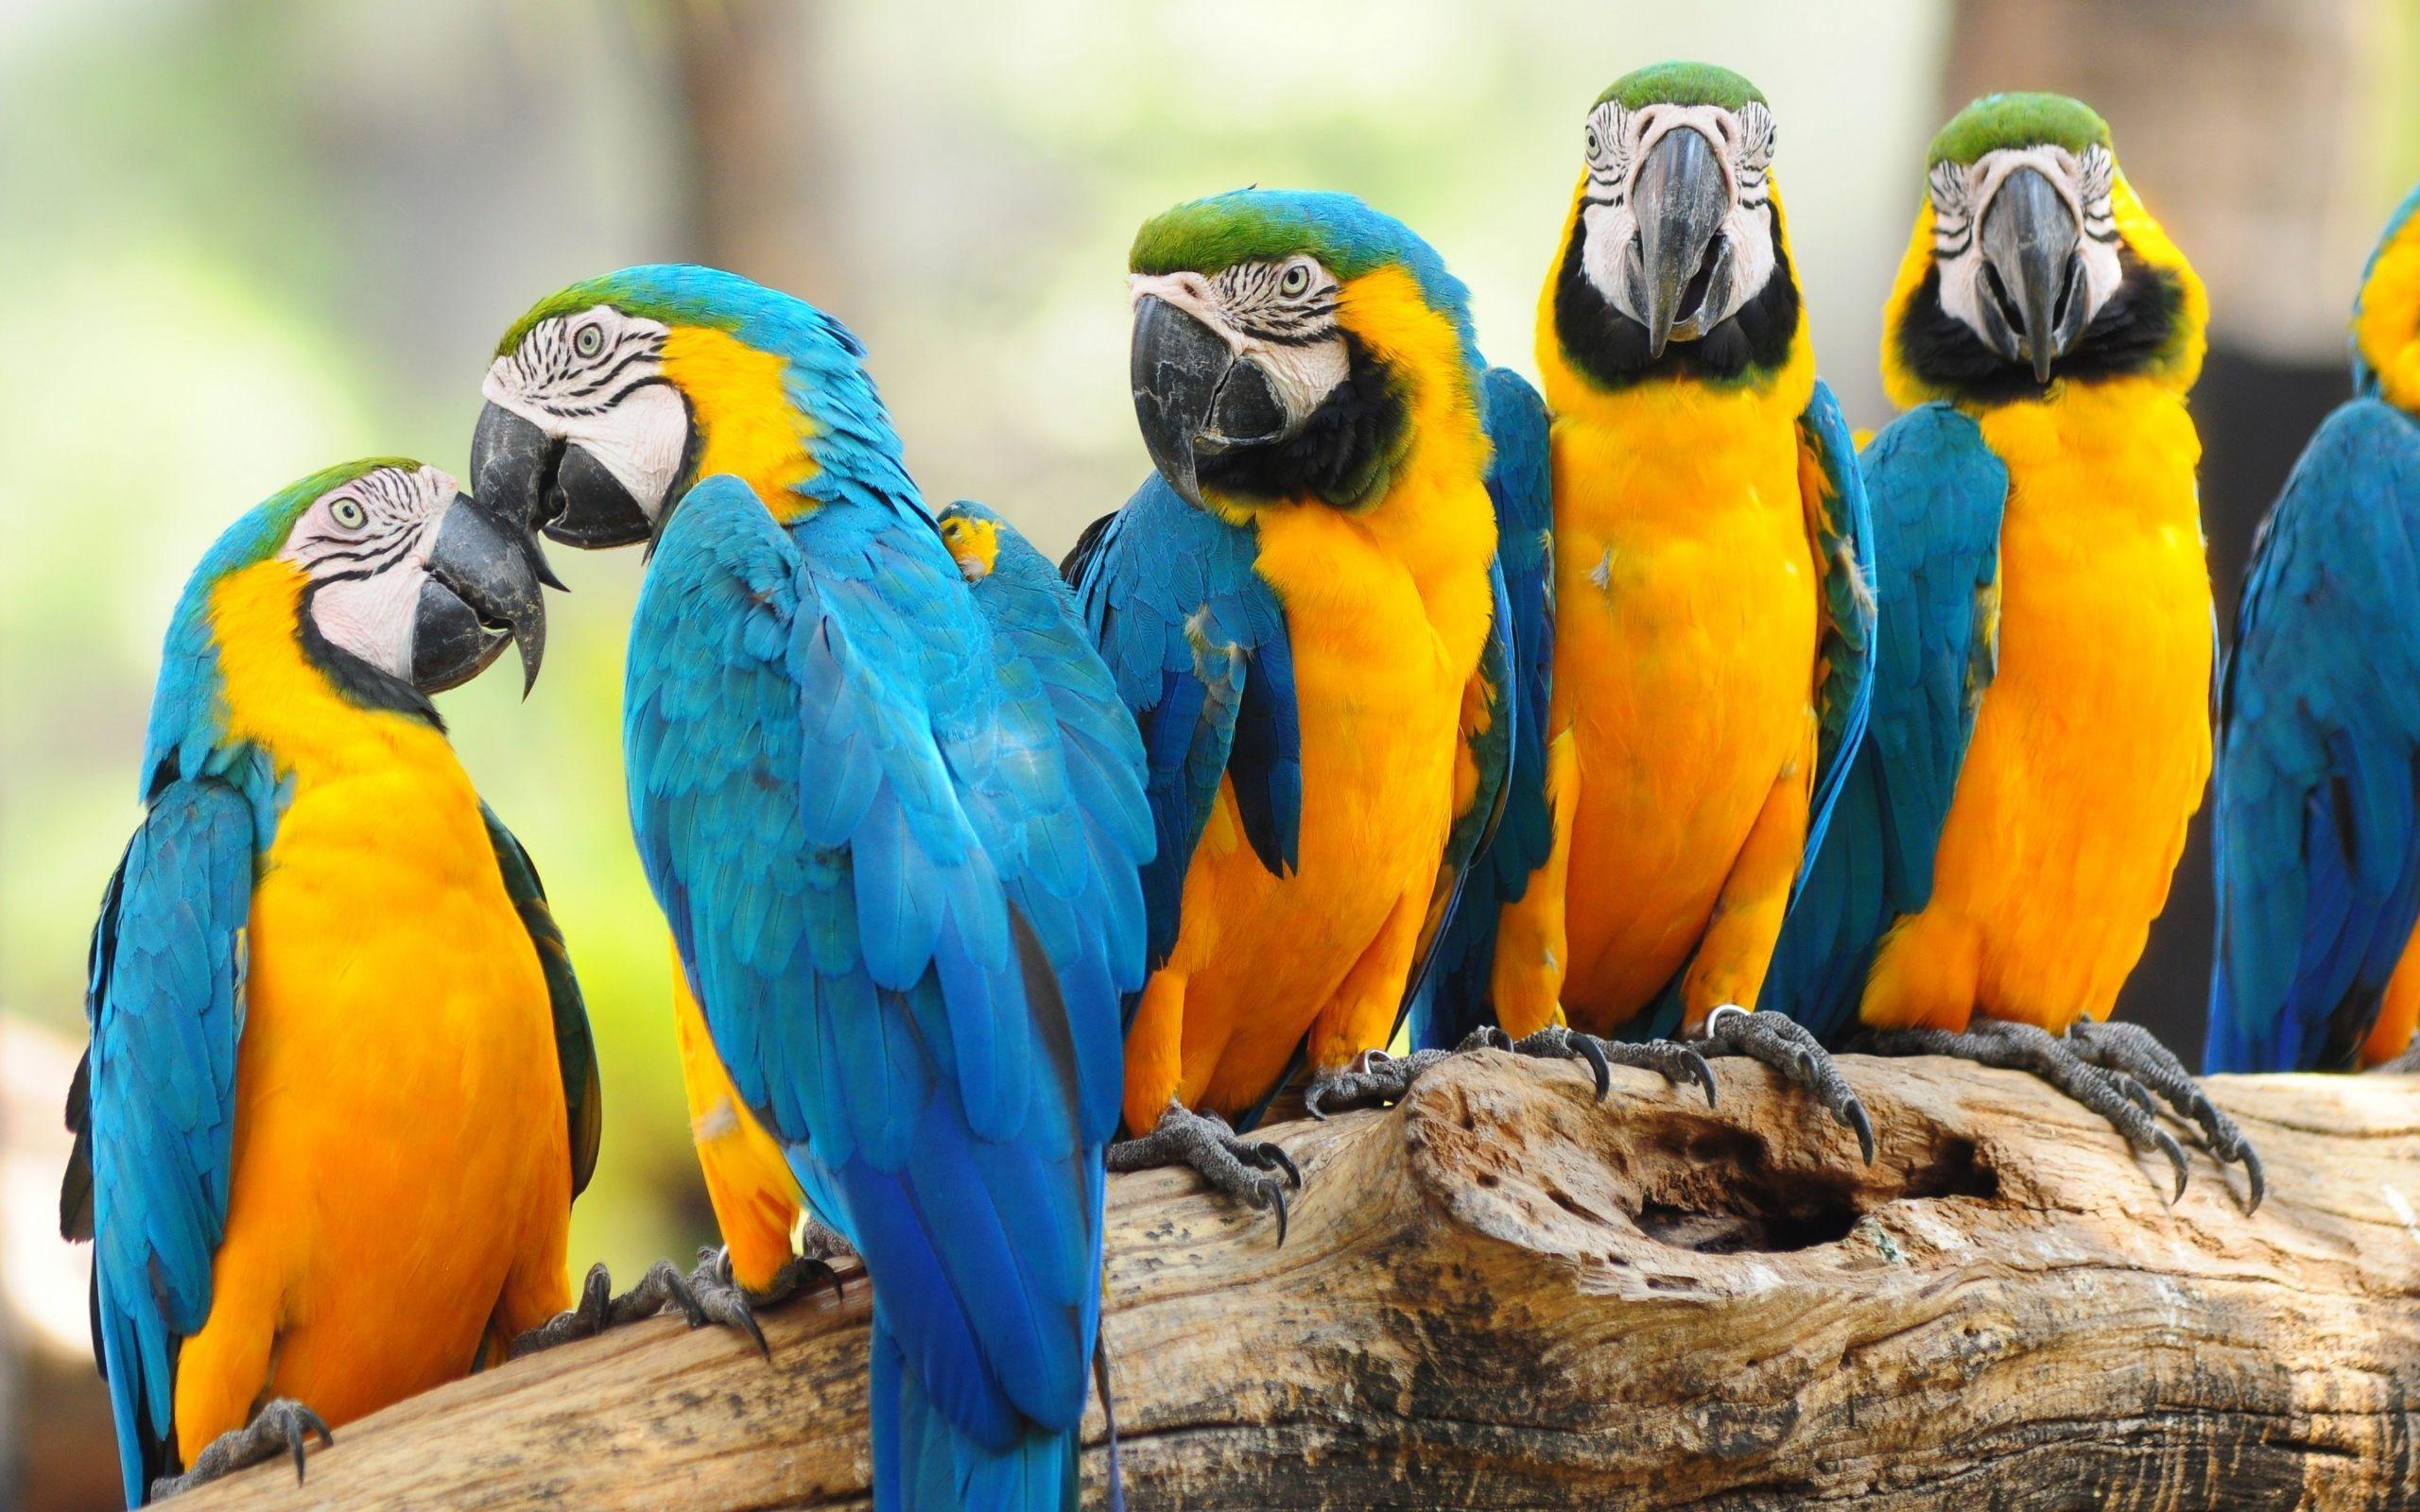 Australian Parrots Hd Wallpaper Download For Desktop Pc Parrot Wallpaper Australian Parrots Parrot